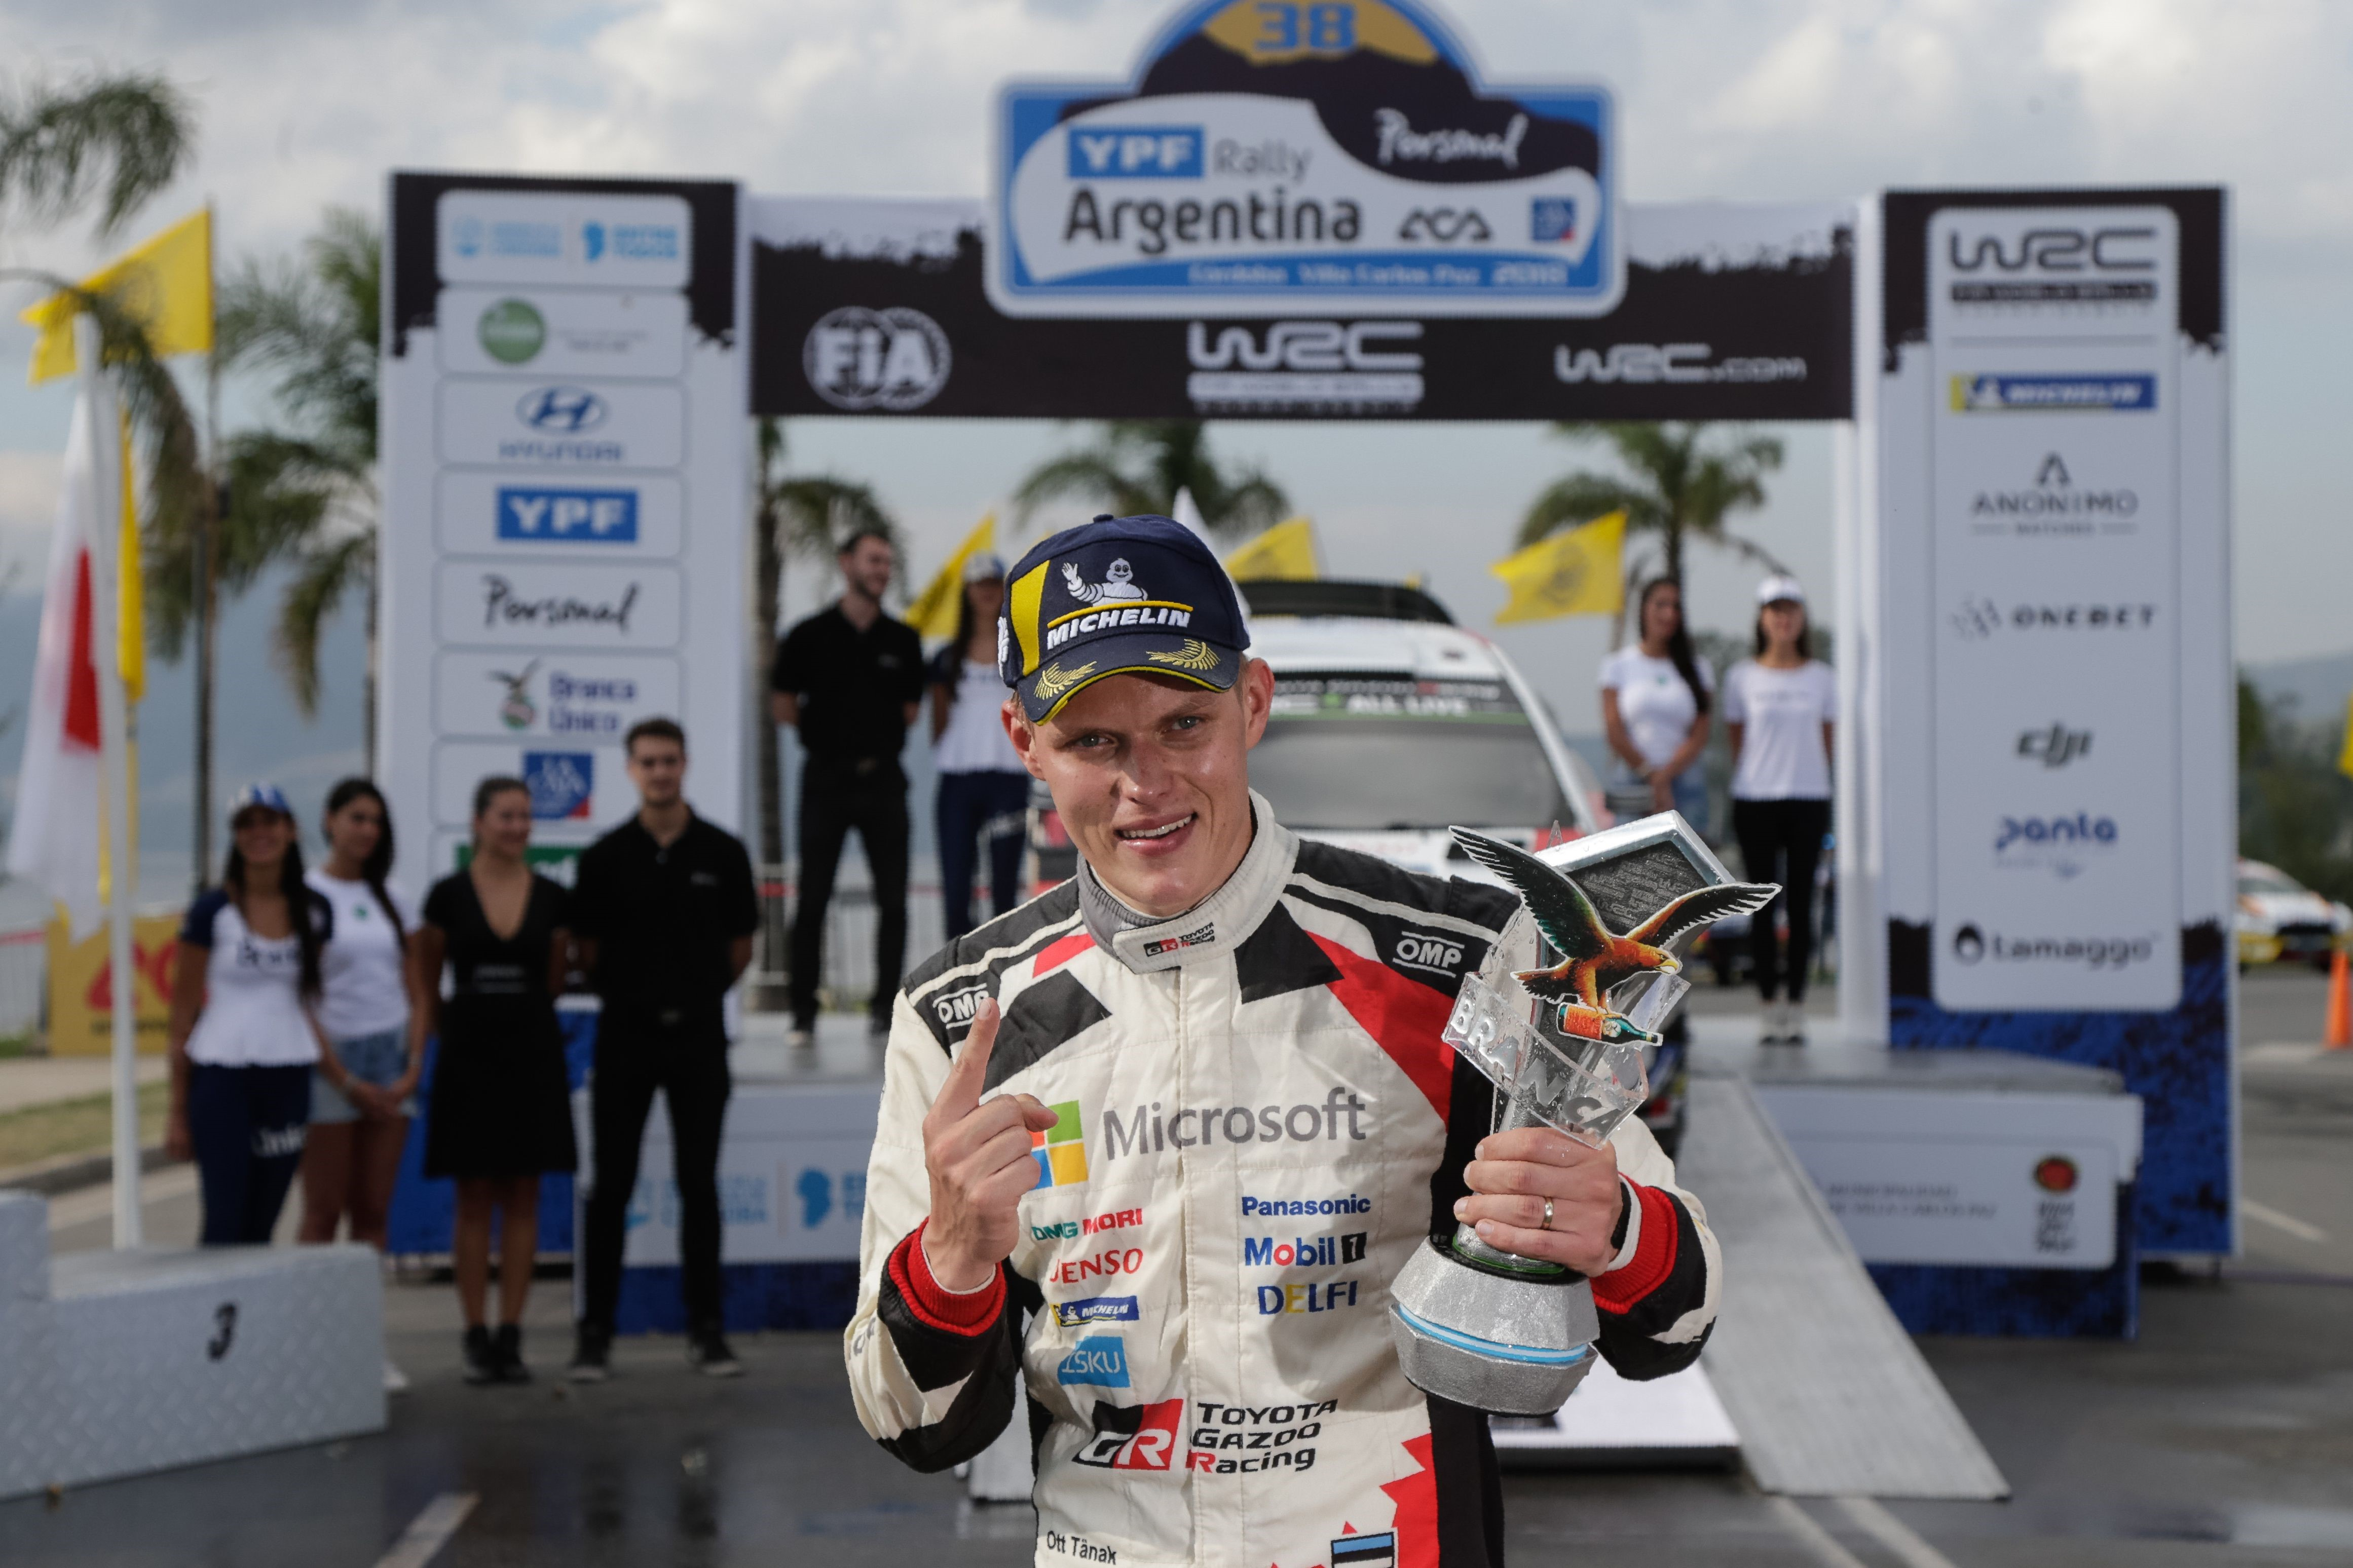 Ott Tänak (Toyota WRT) au Rallye d'Argentine 2018